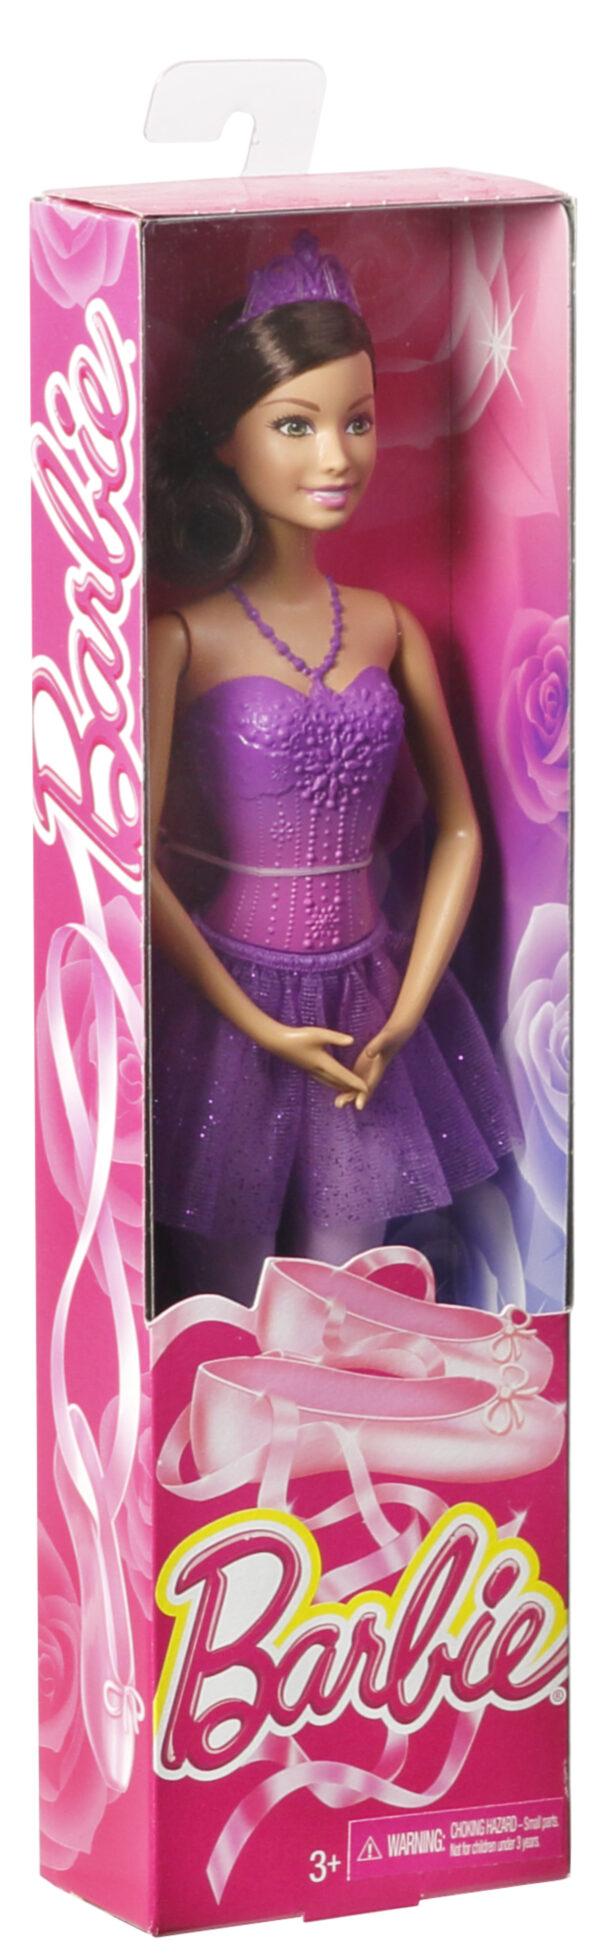 Barbie Fairytale - Bambola Ballerina, Abito Rosa, Bionda Femmina 12-36 Mesi, 12+ Anni, 8-12 Anni ALTRI Barbie